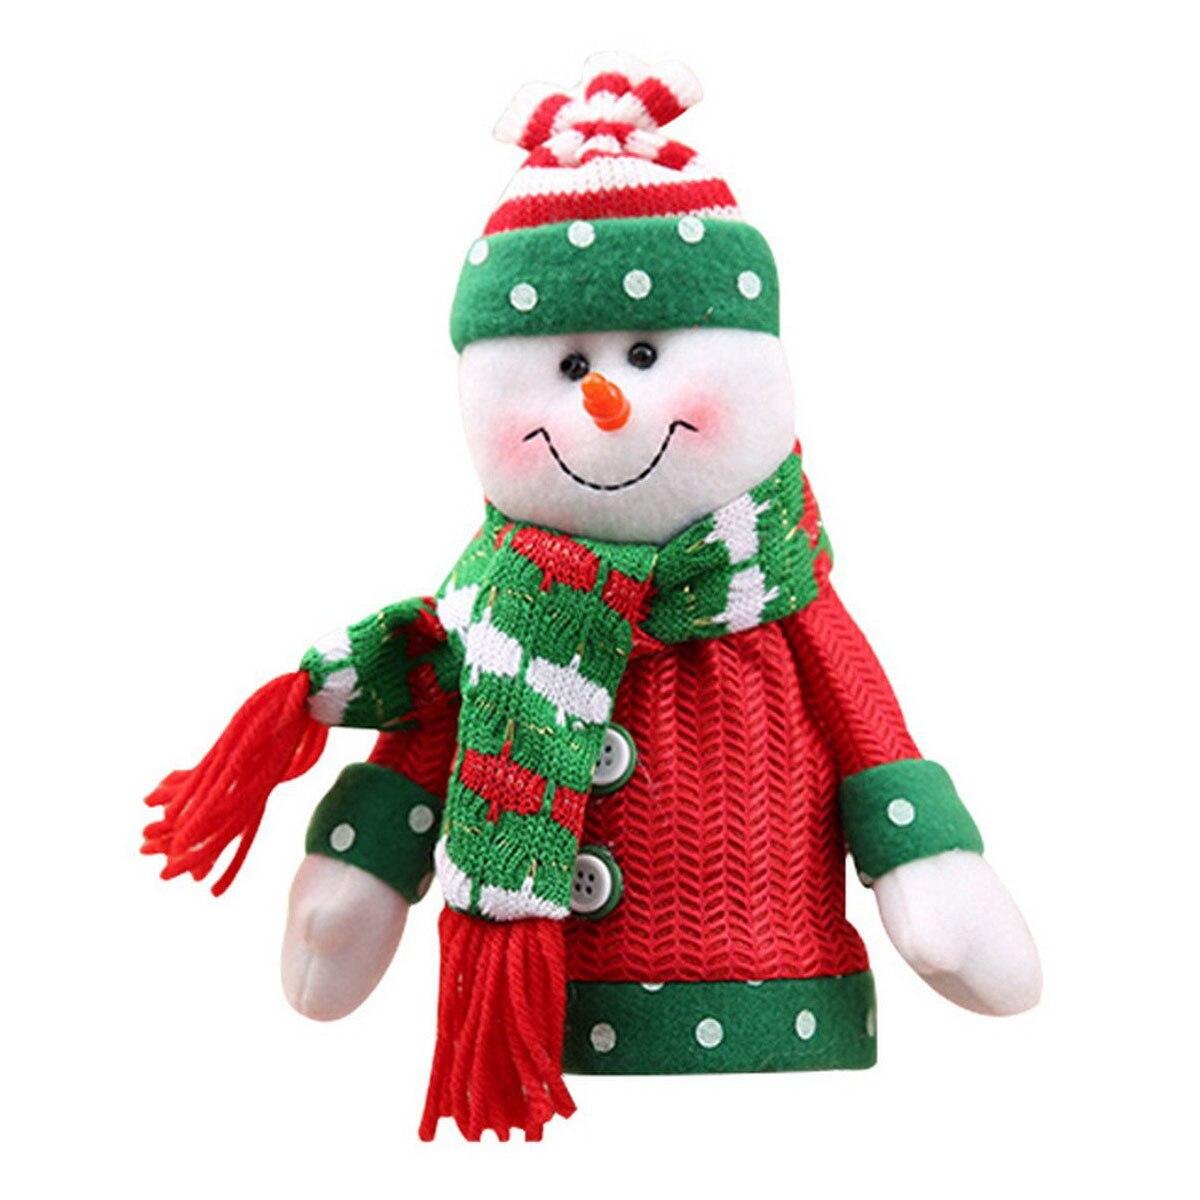 Christmas wine bottle decoration bag christmas party mood table decoration Christmas snowman